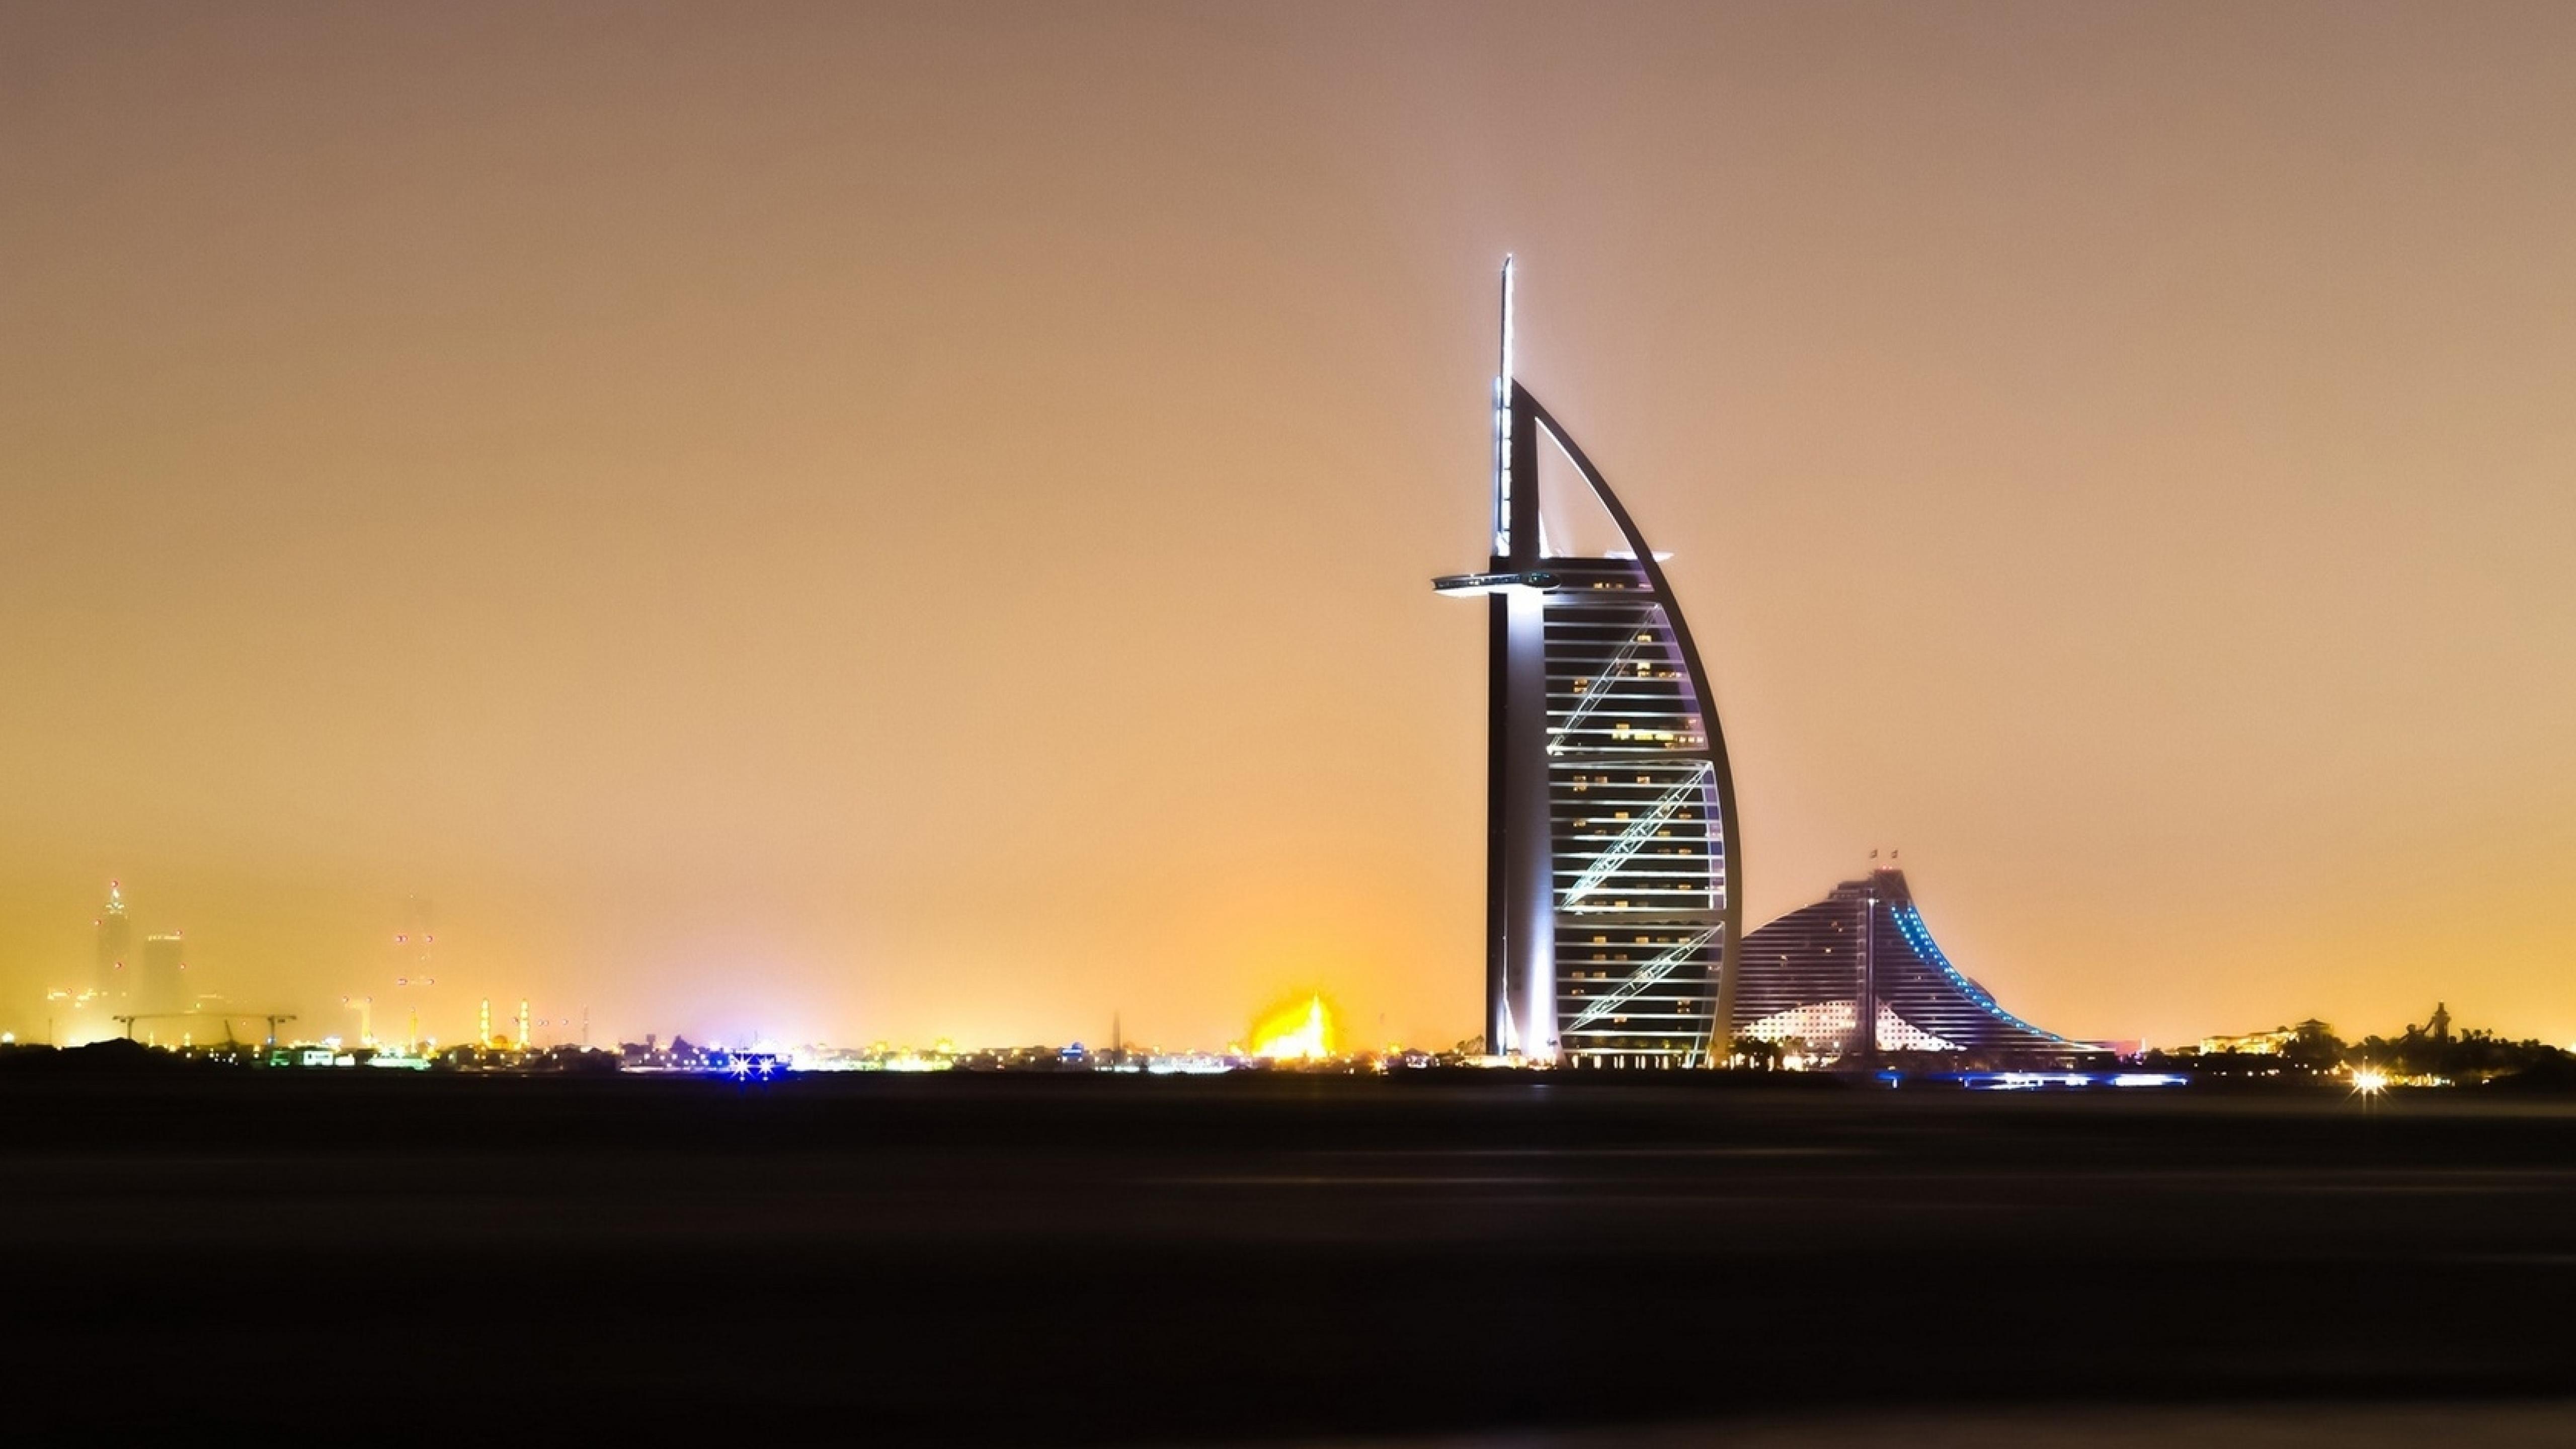 5120x2880 Dubai Home Burj Al Arab 5k Wallpaper Hd City 4k